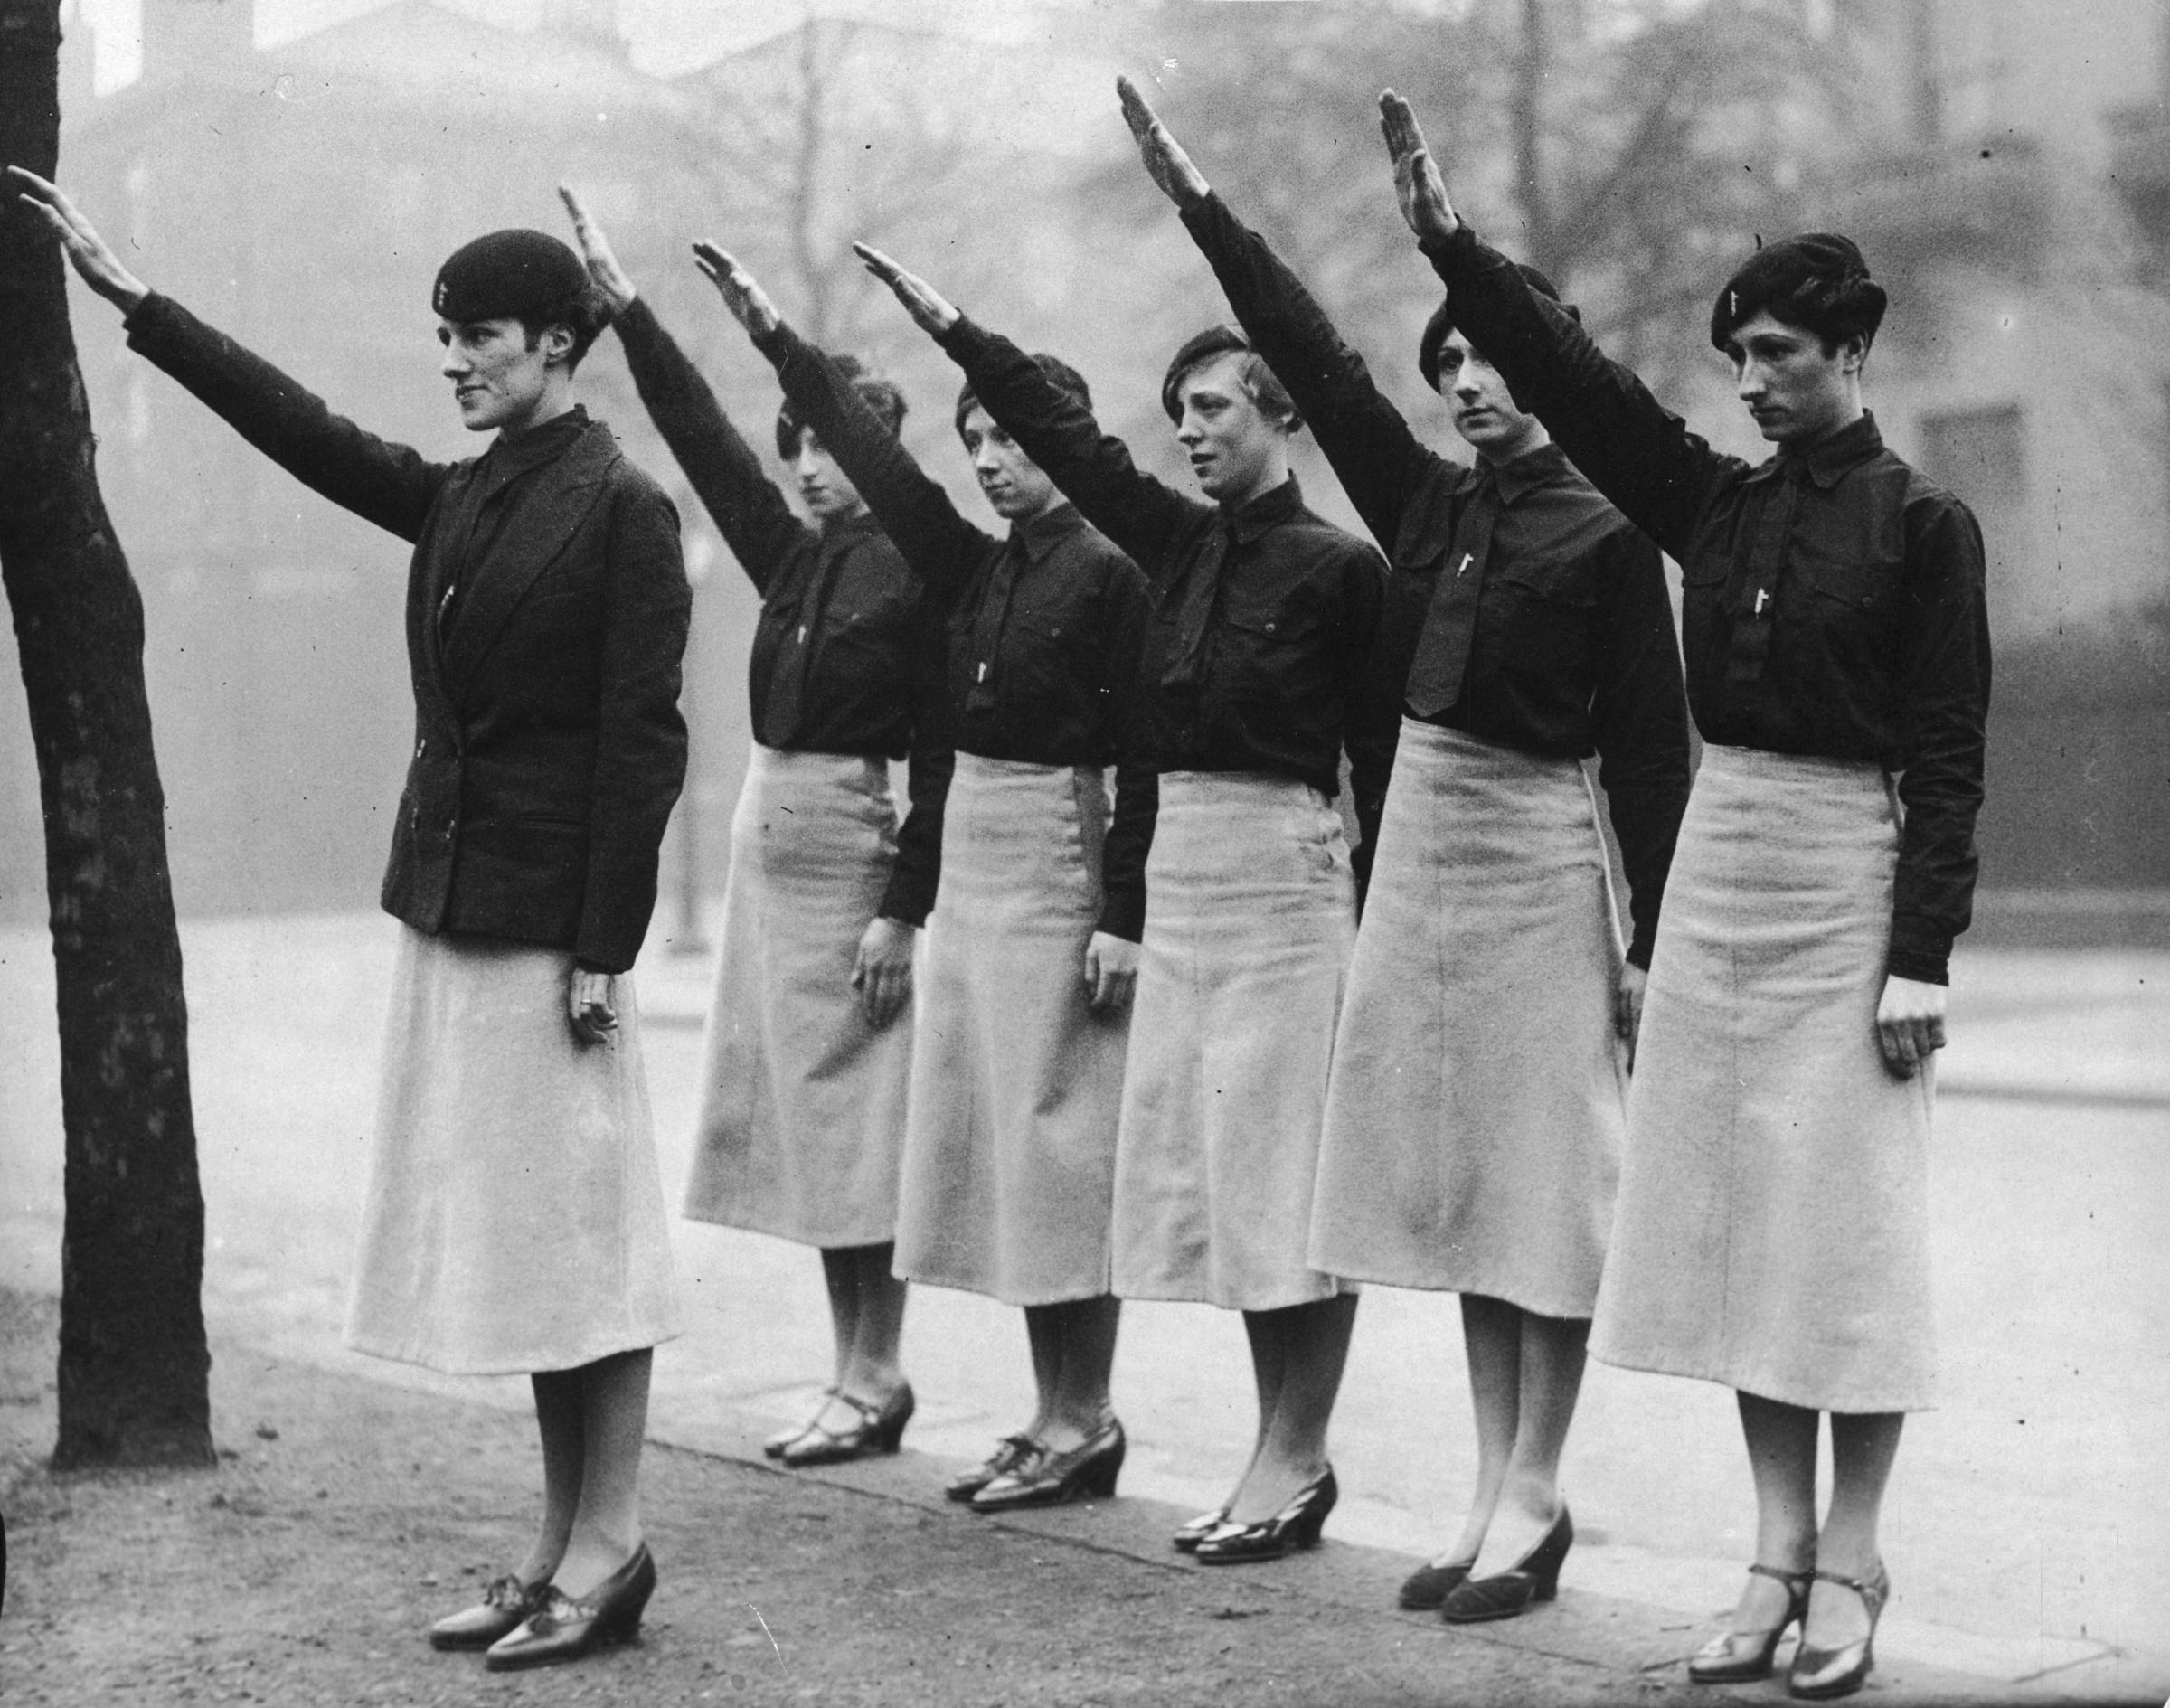 Female Blackshirts in Liverpool